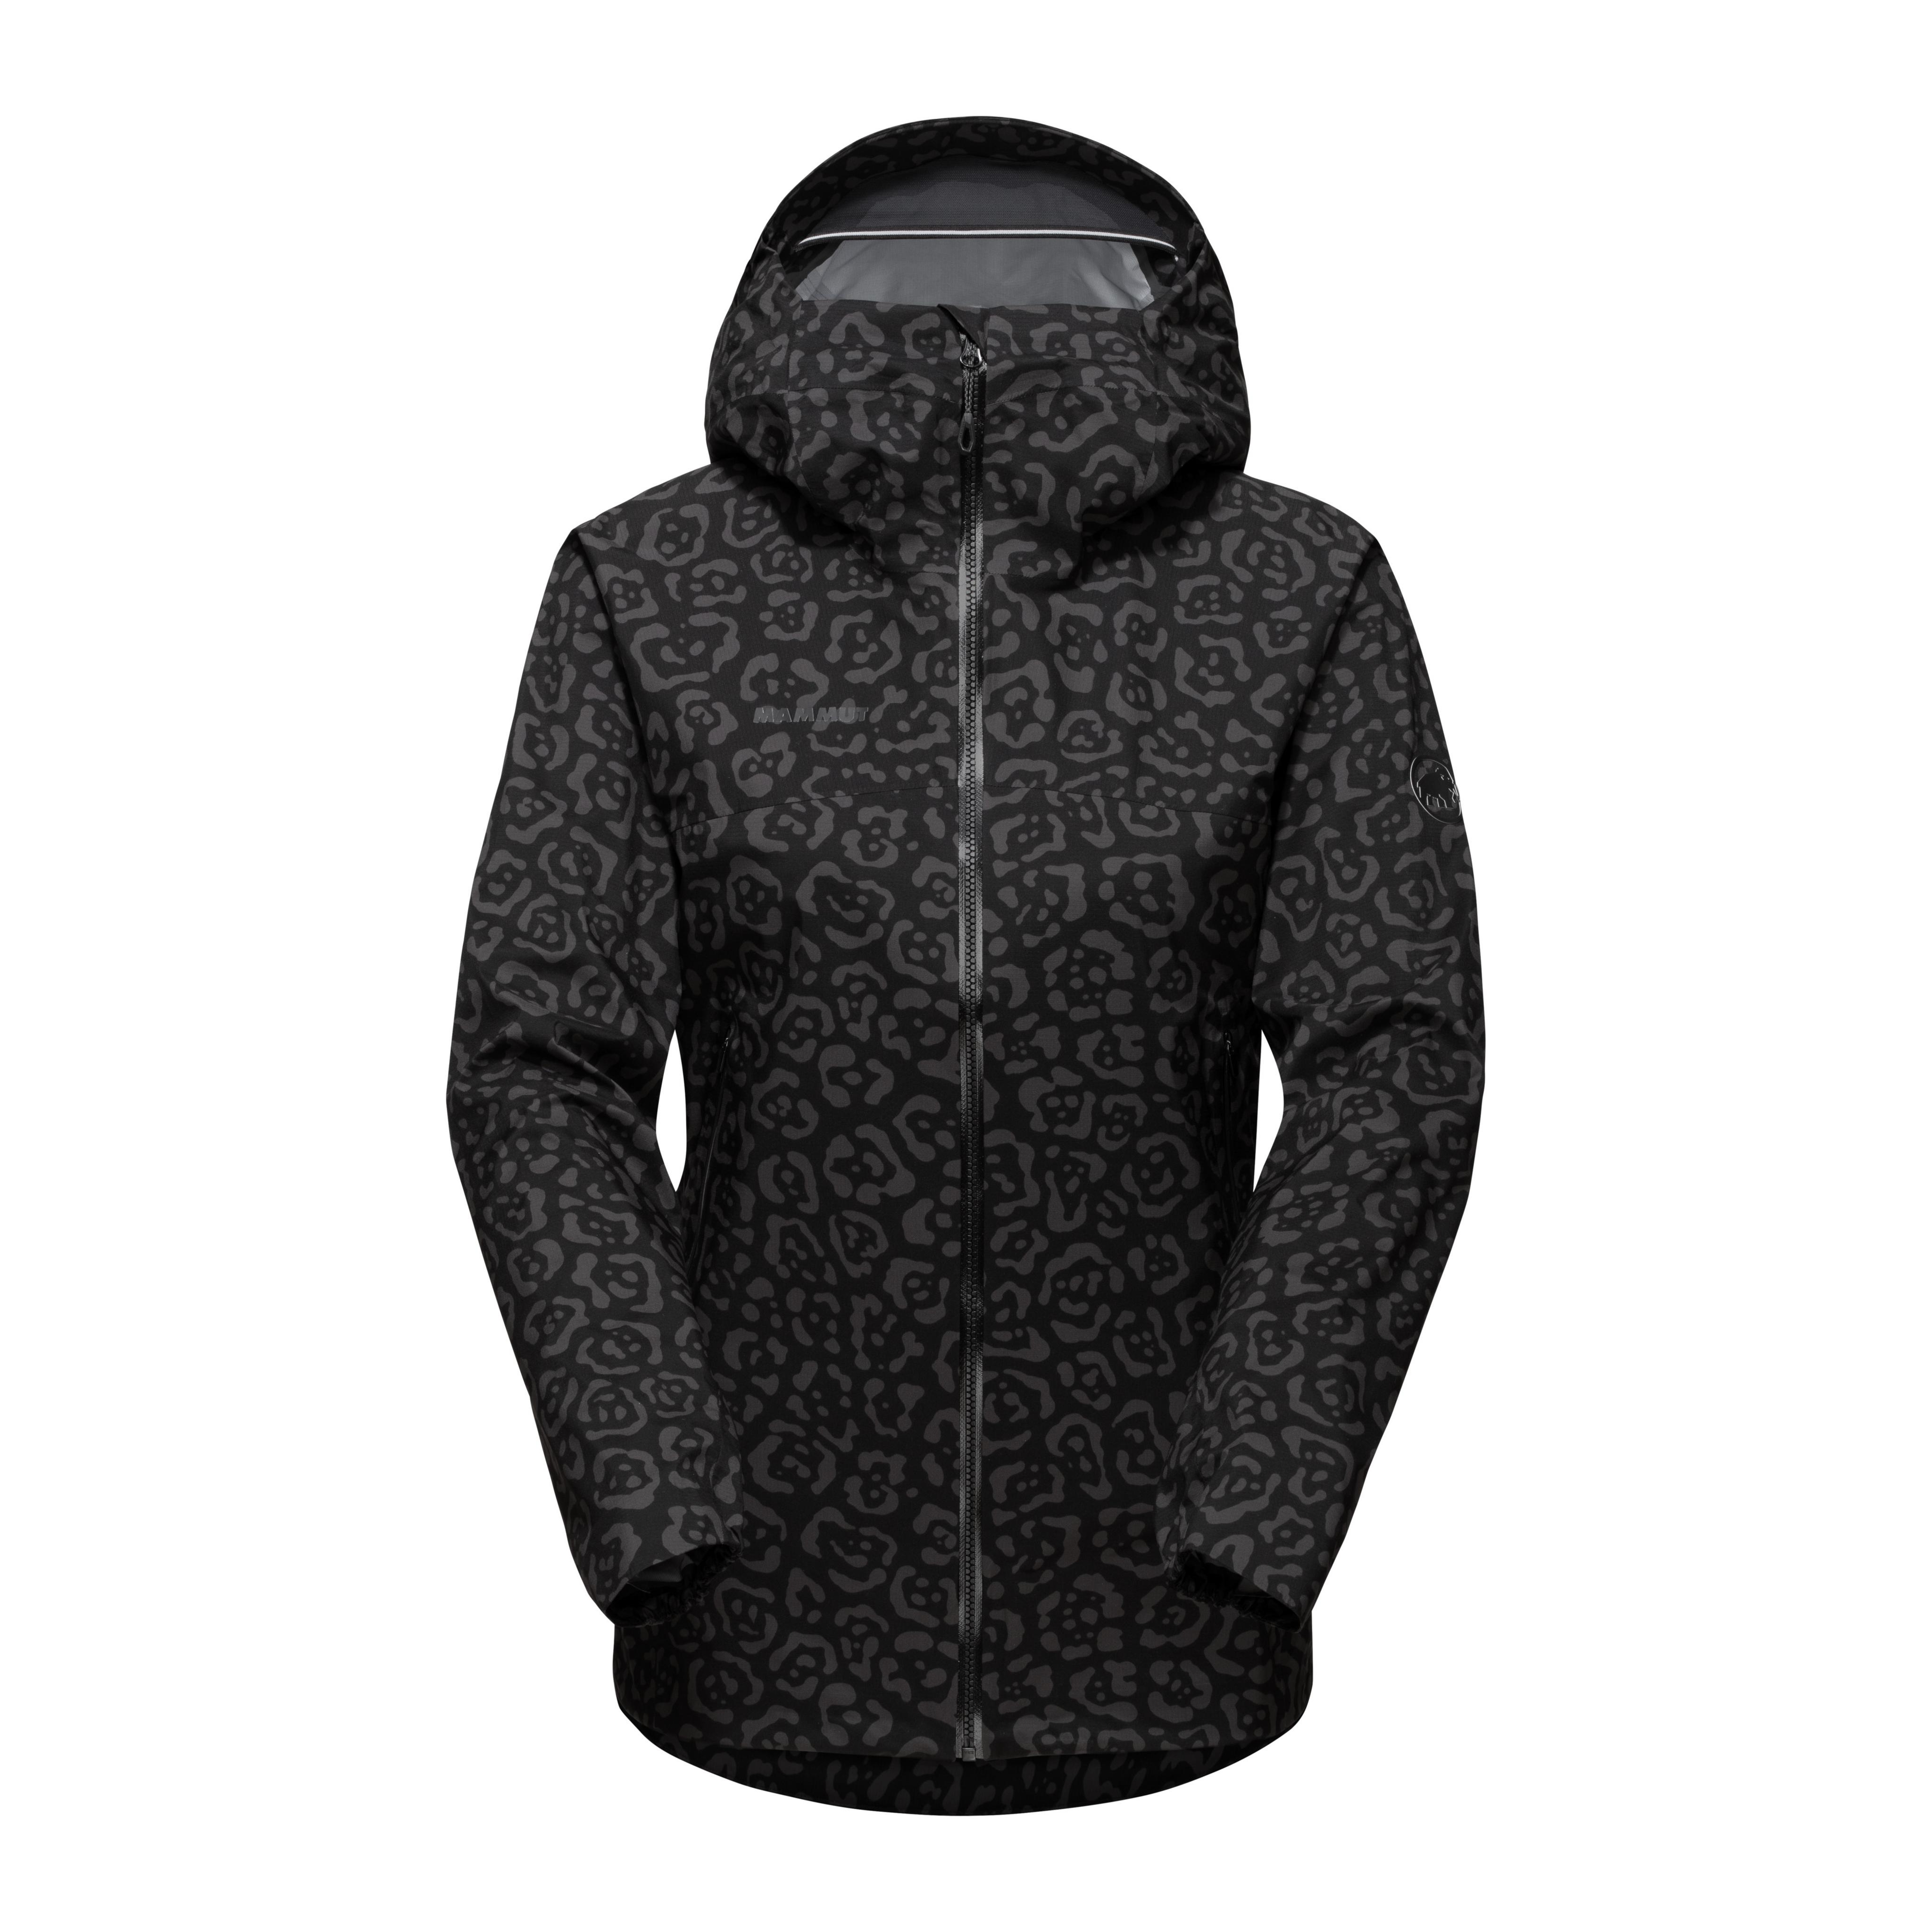 Masao Light HS Hooded Jacket Women - black, XS thumbnail